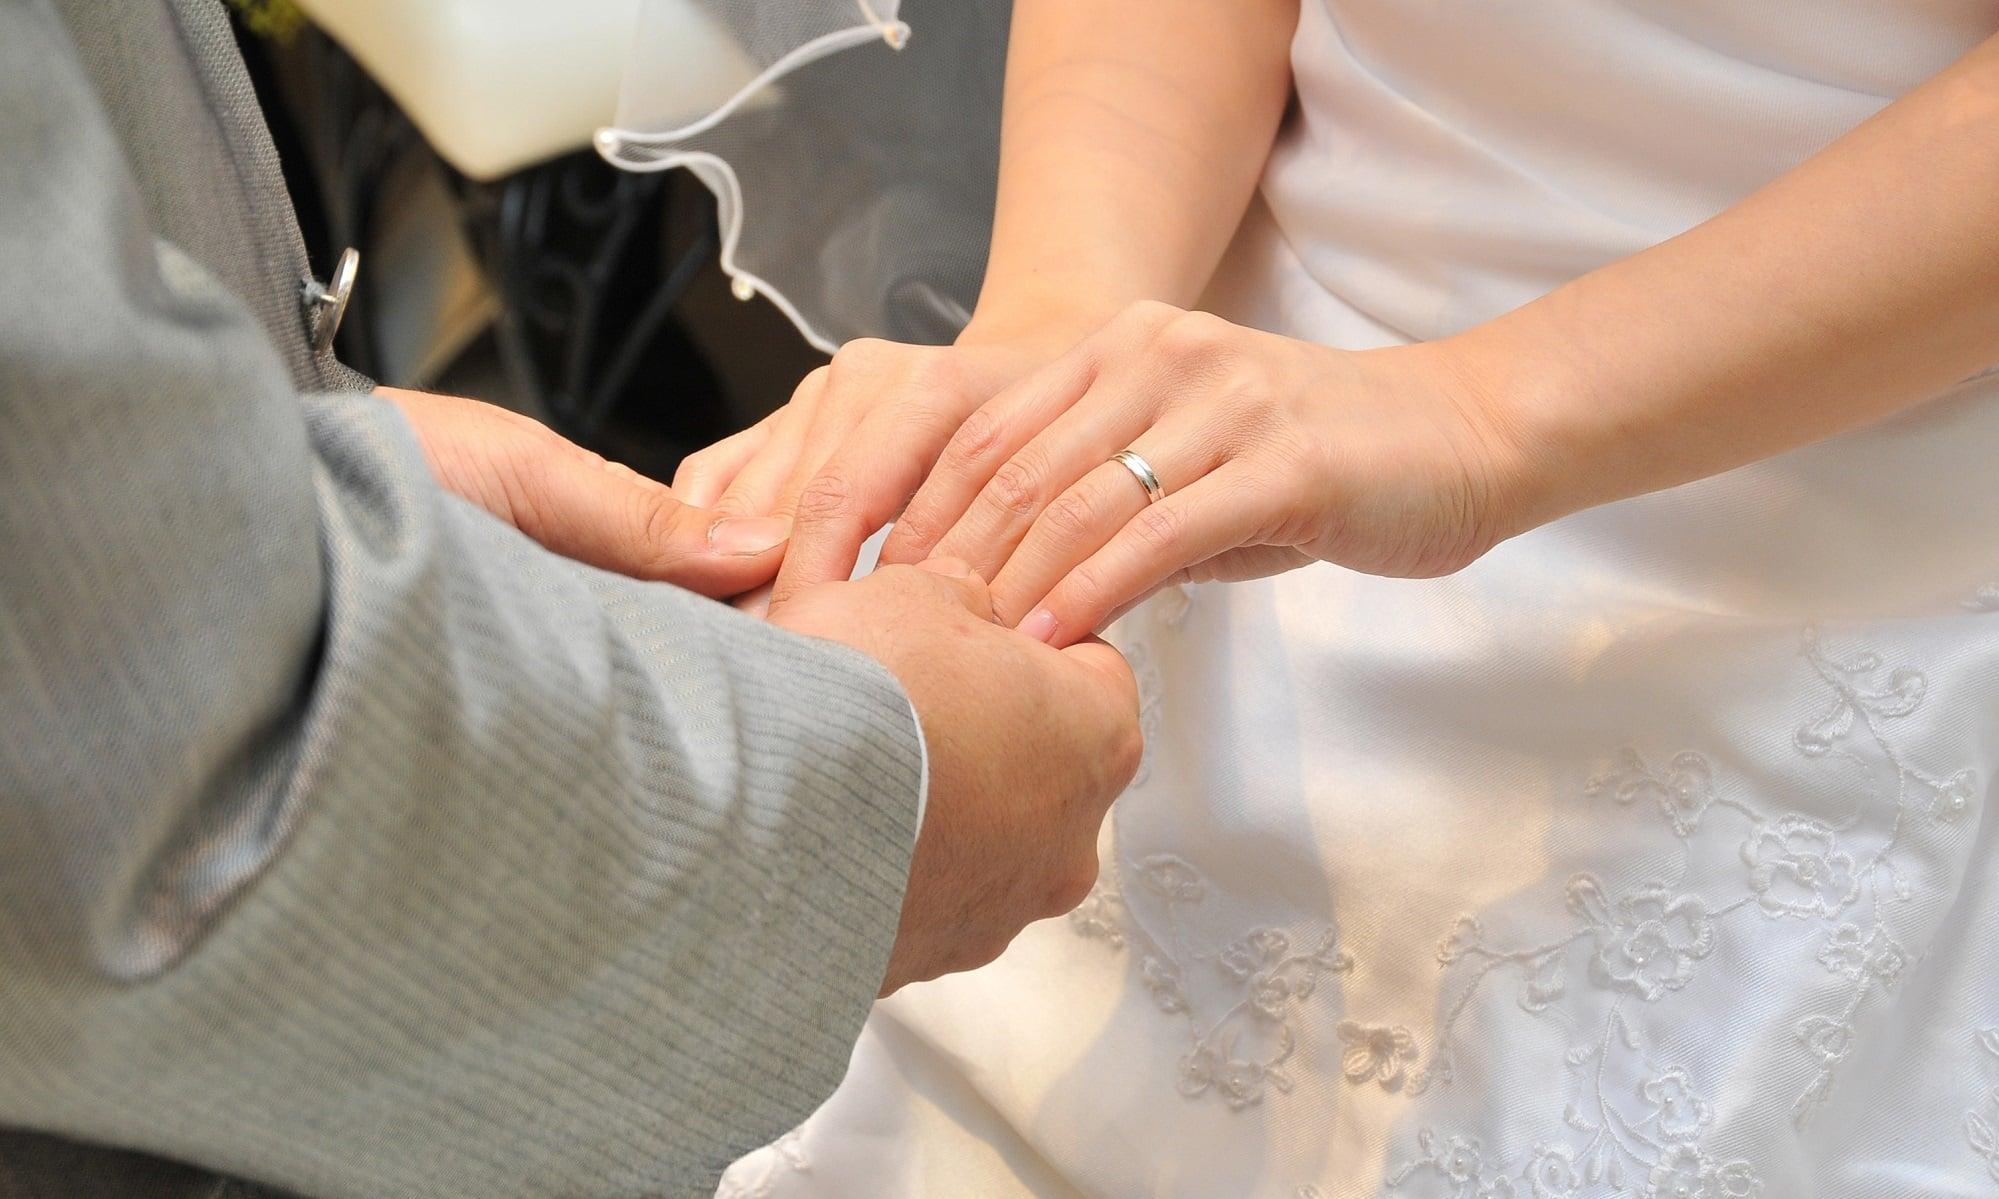 f3443913f6c7549ff389080da0234f18 - 【難病持ちは結婚できない?】結婚・出産をしたい難病のある方へ こんなメッセージをいただきました